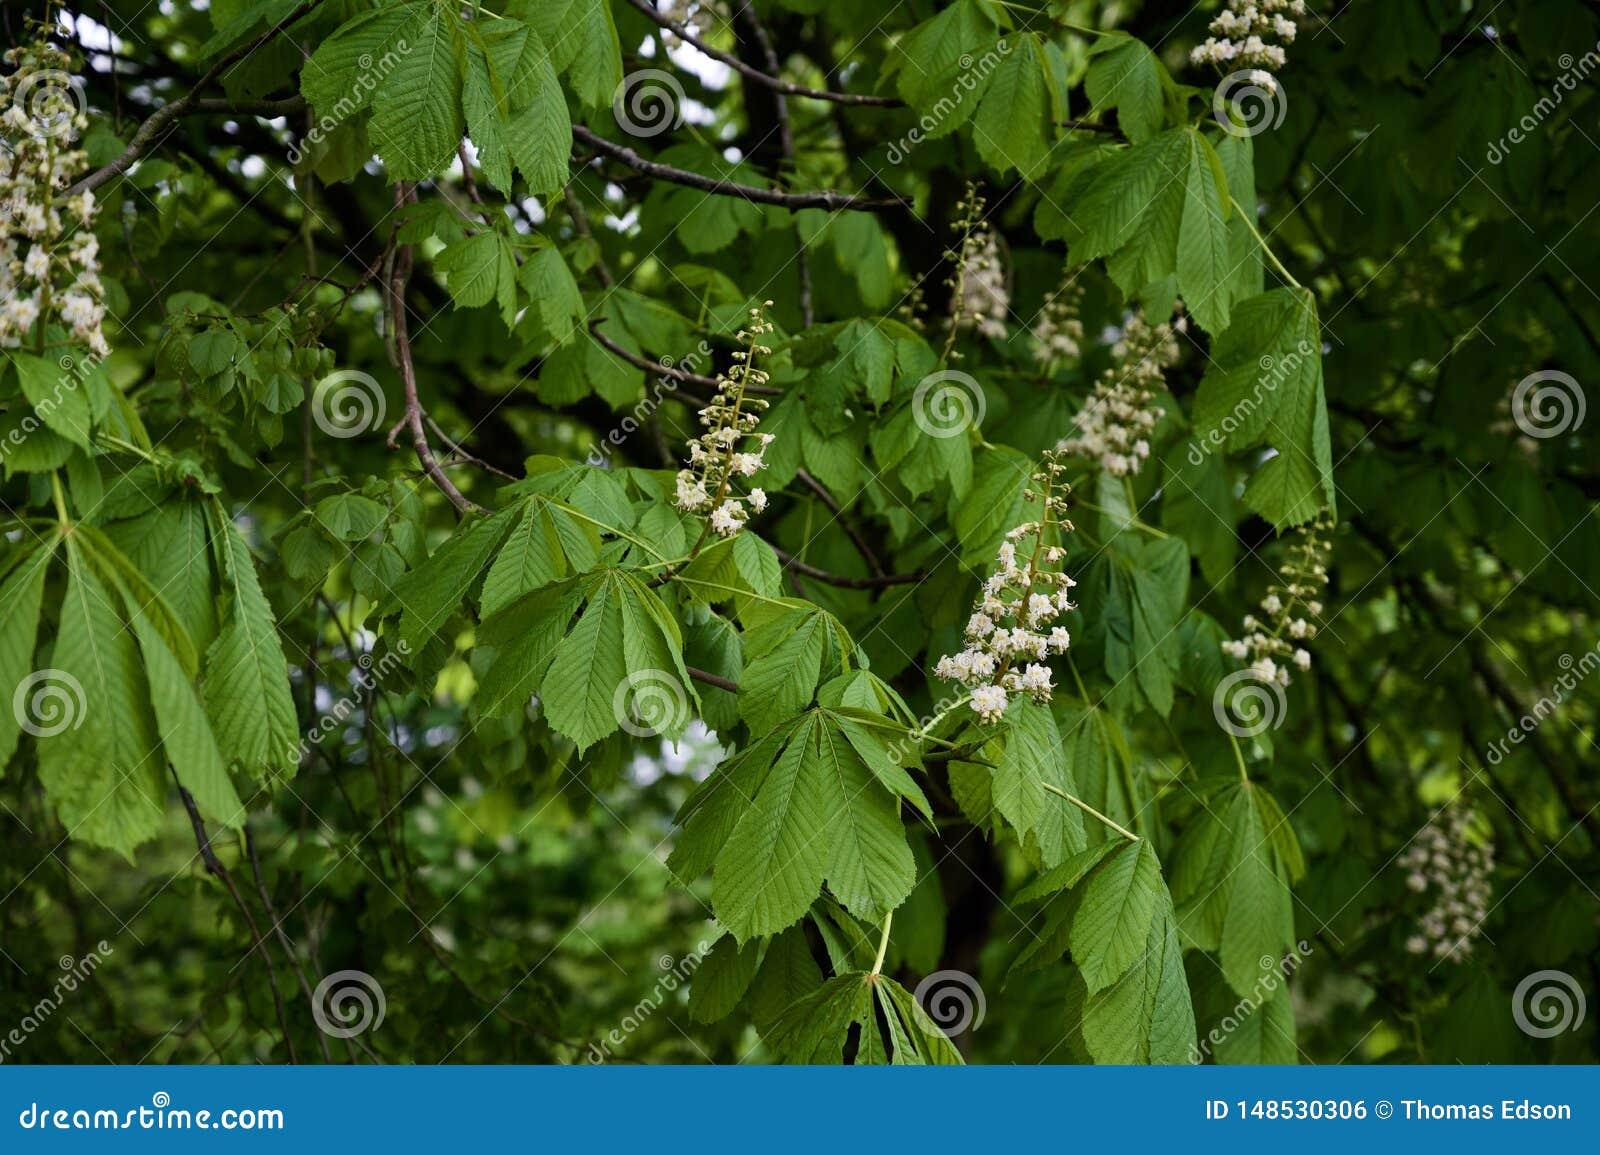 Horse Chestnut Conker Tree in bloom